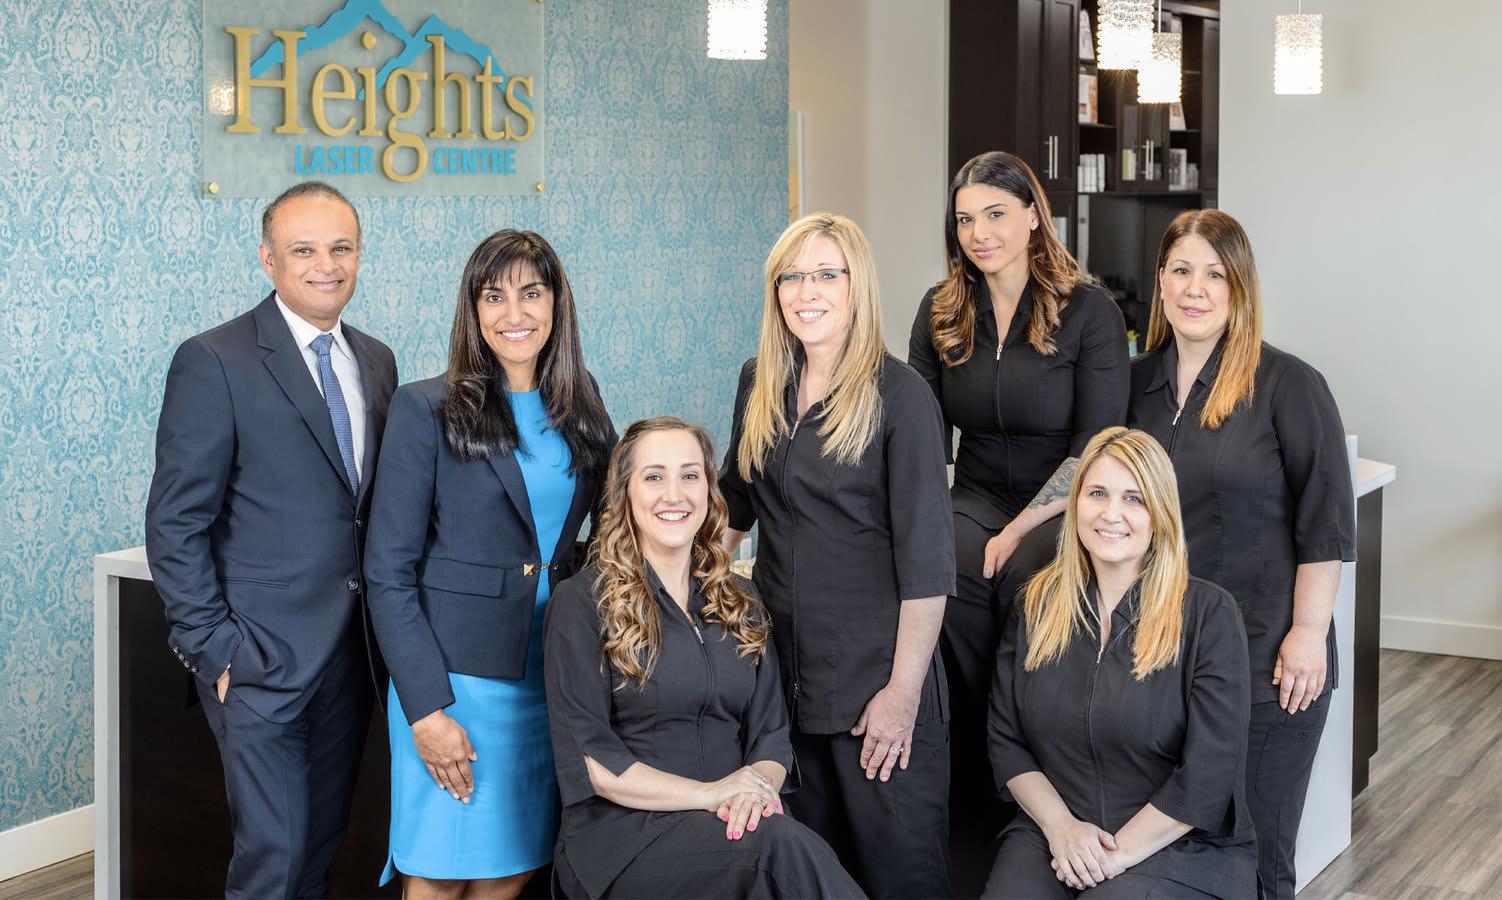 Heights laser centre medical spa staff